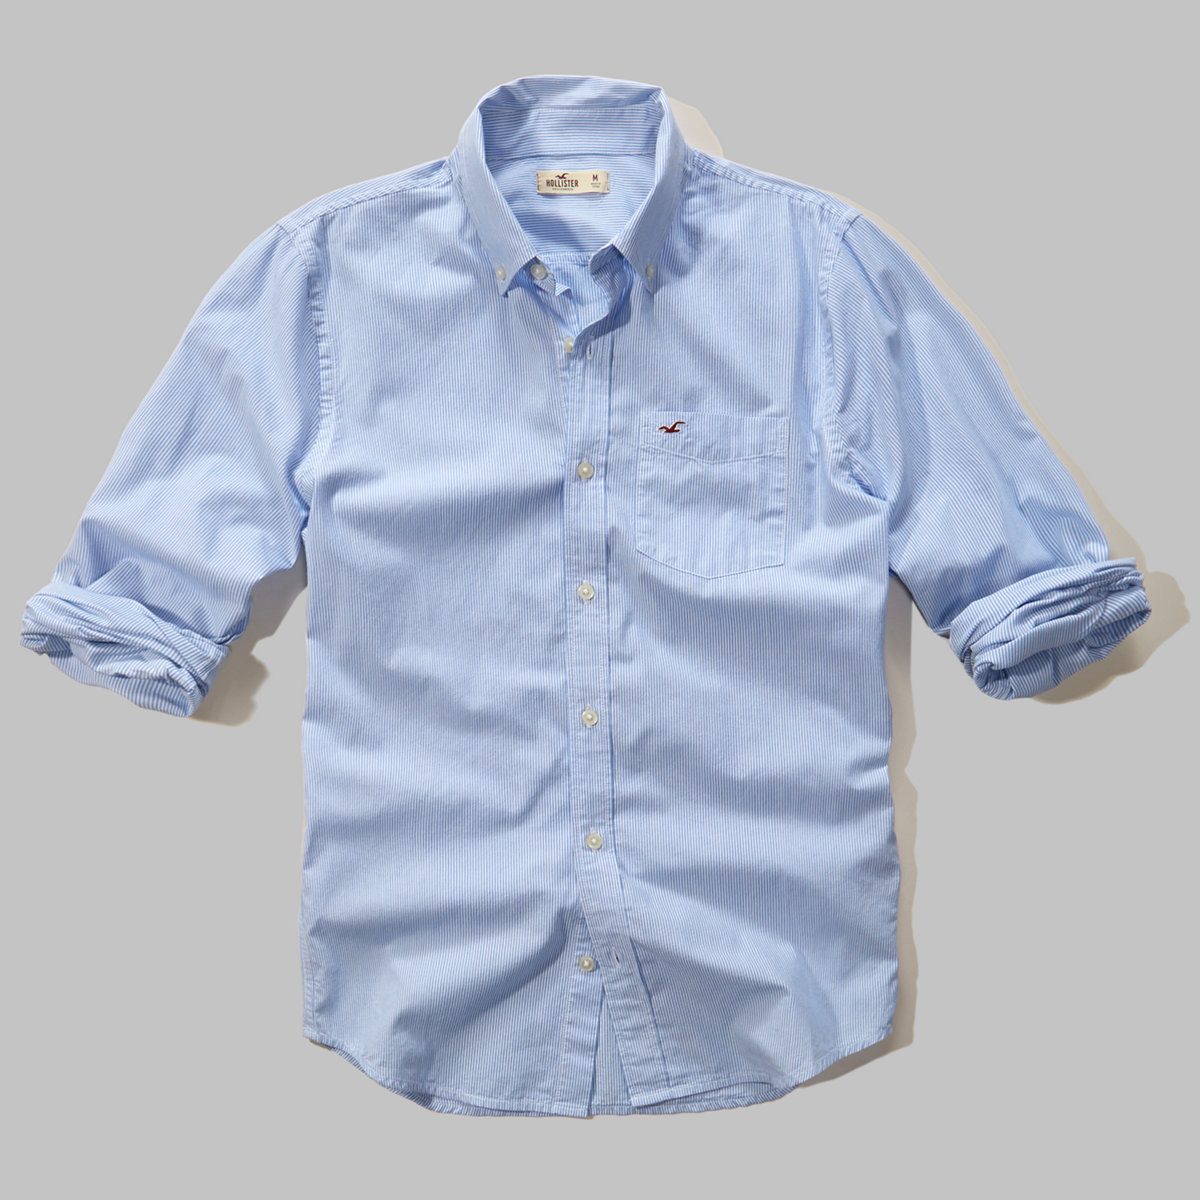 Light Blue Microstripe Shirt